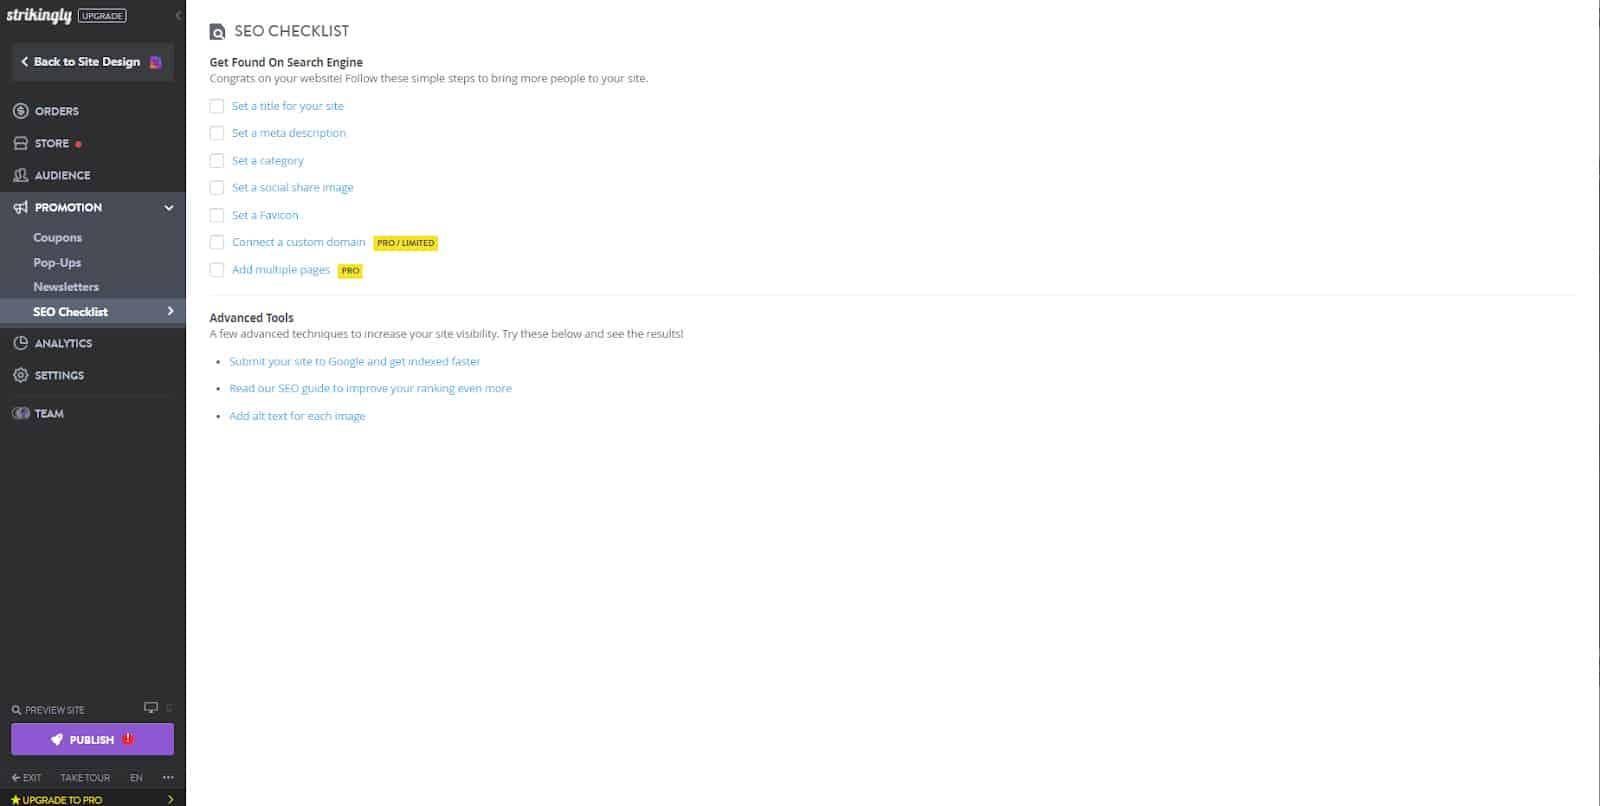 Screenshot of Strikingly SEO checklist dashboard